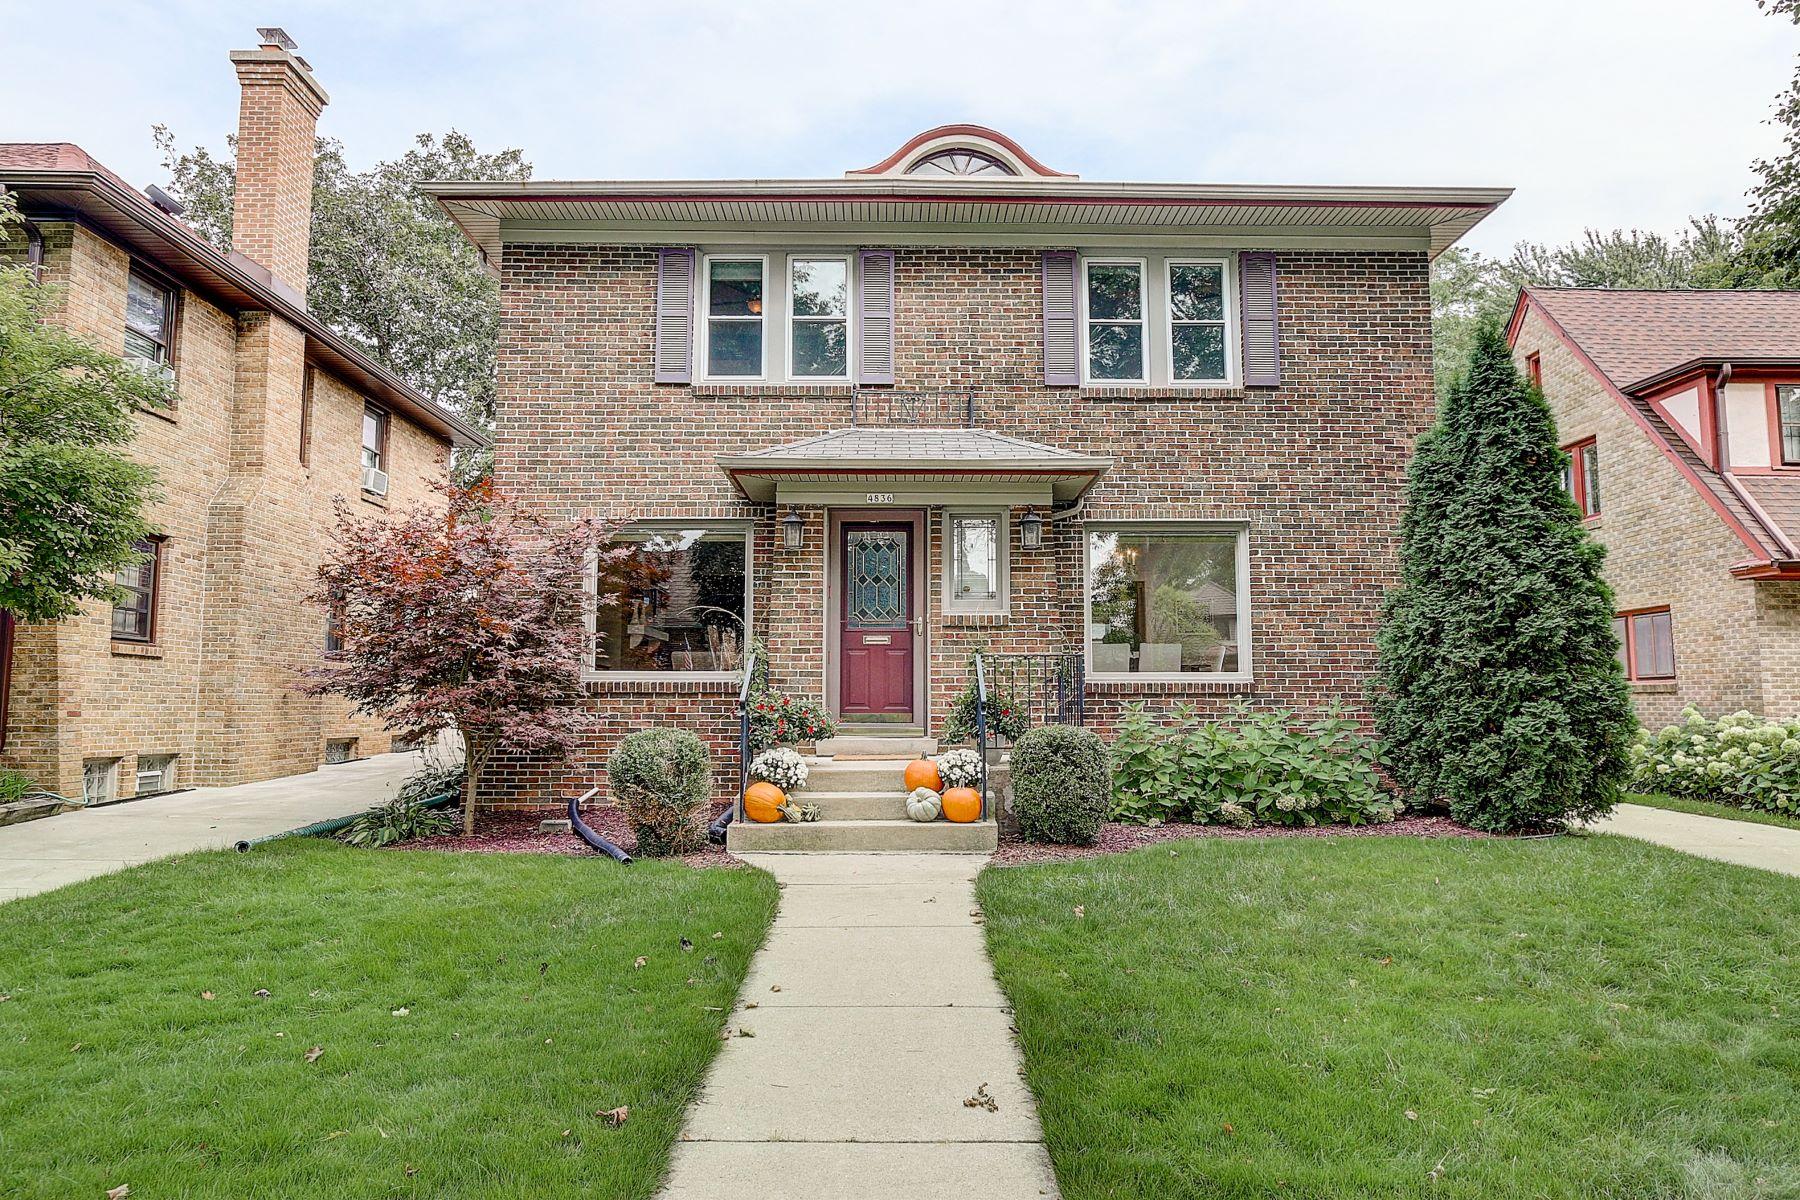 Single Family Homes для того Продажа на 4836 N Woodburn St 4836 N. Woodburn St., Milwaukee, Висконсин 53217 Соединенные Штаты